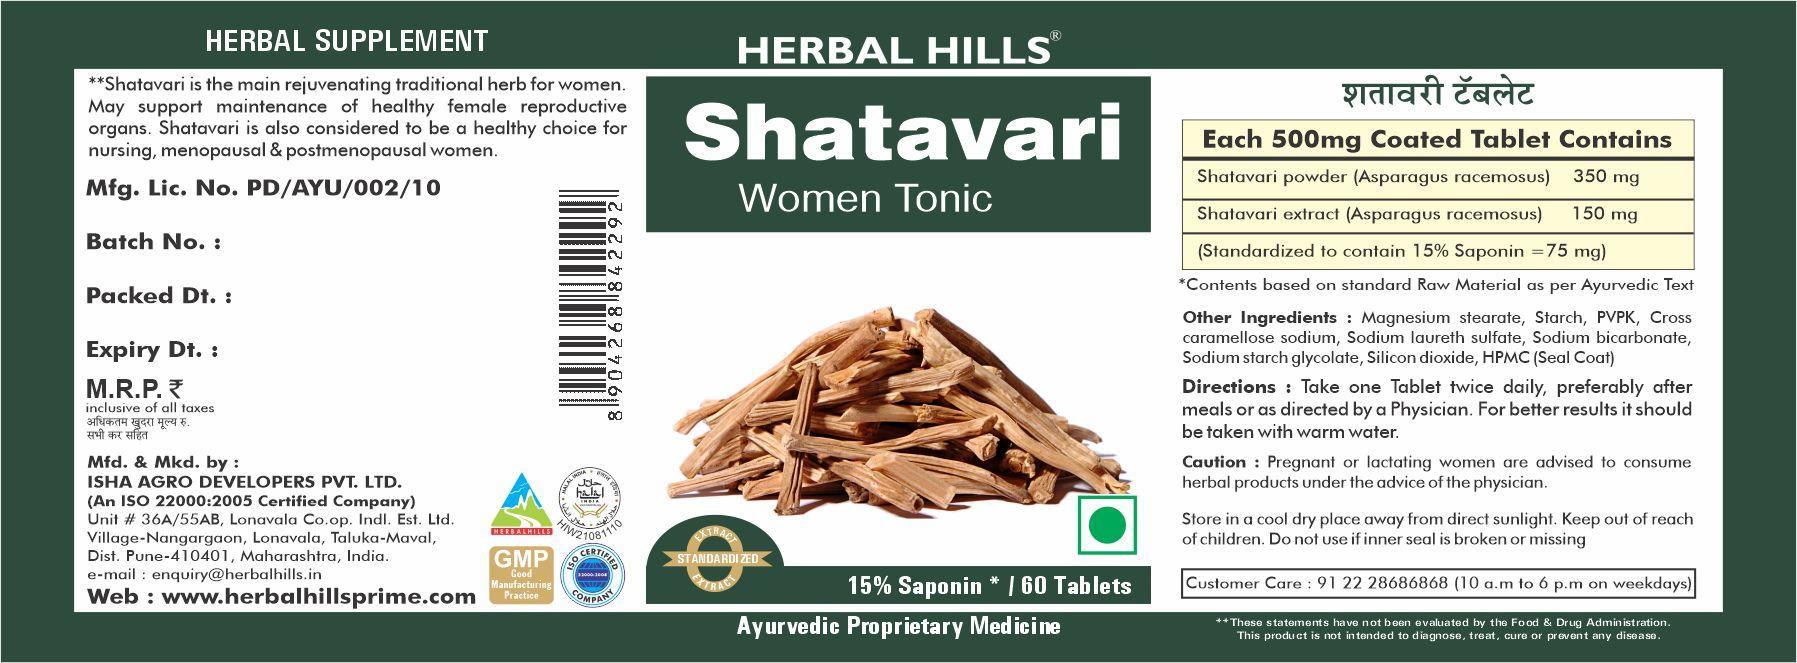 Herbal Hills Shatavari 60 Tablets Shatavari (Asparagus racemosus) 500mg